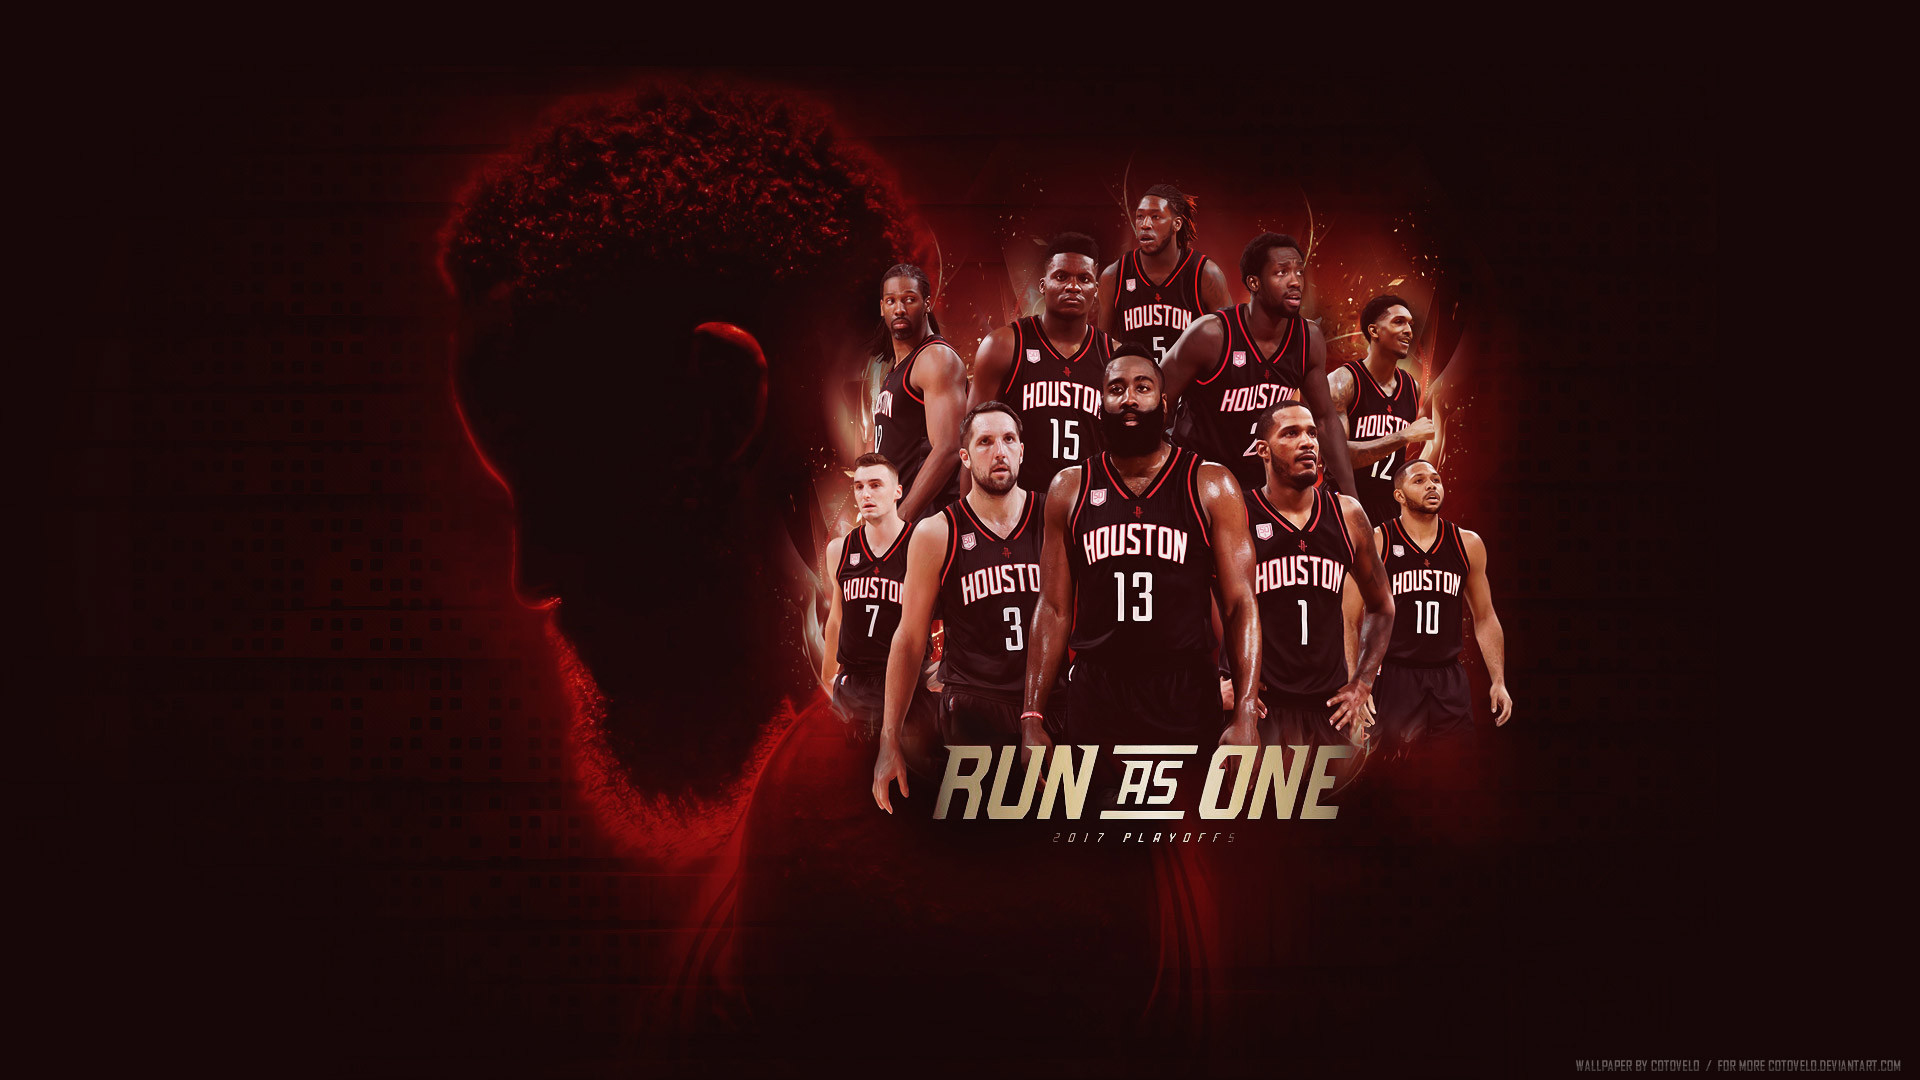 Cute Nike Wallpapers Nba Basketball Wallpaper 2018 63 Images